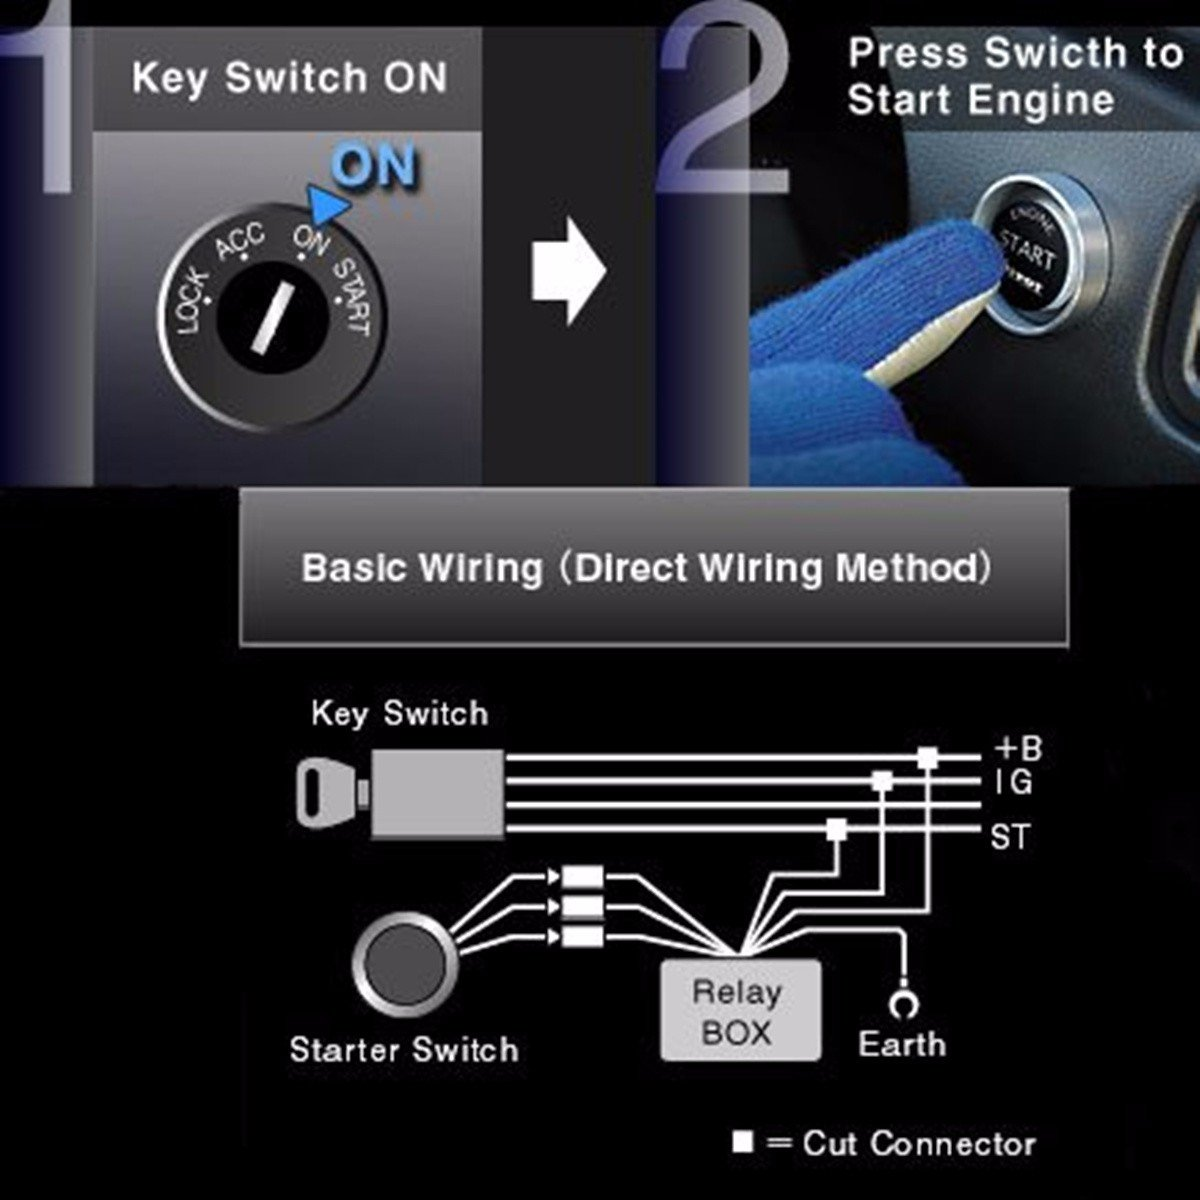 Eluto Ignition Switchled Auto Engine Starter Push Button On Switch Wiring Diagram Kitred Illumination Car Motorbike